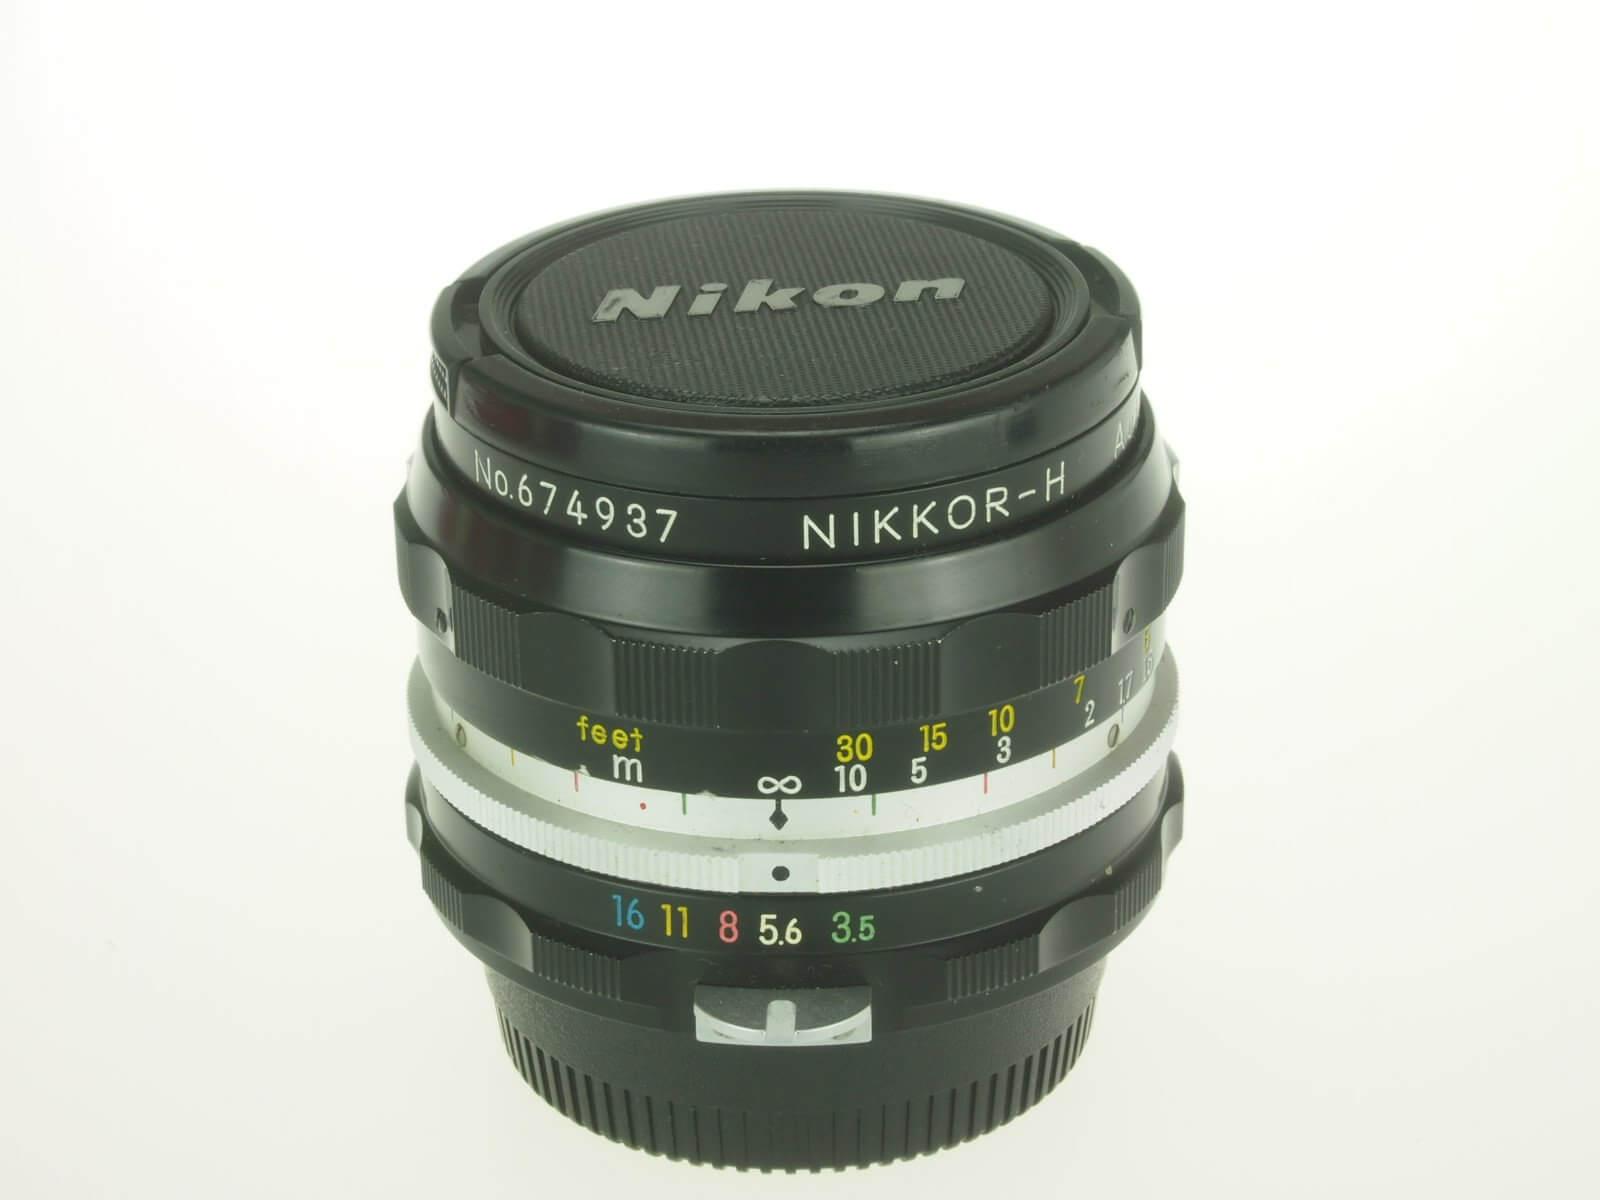 Nikon 28 f3.5 Nikkor, pre-AI lens, excellent user!